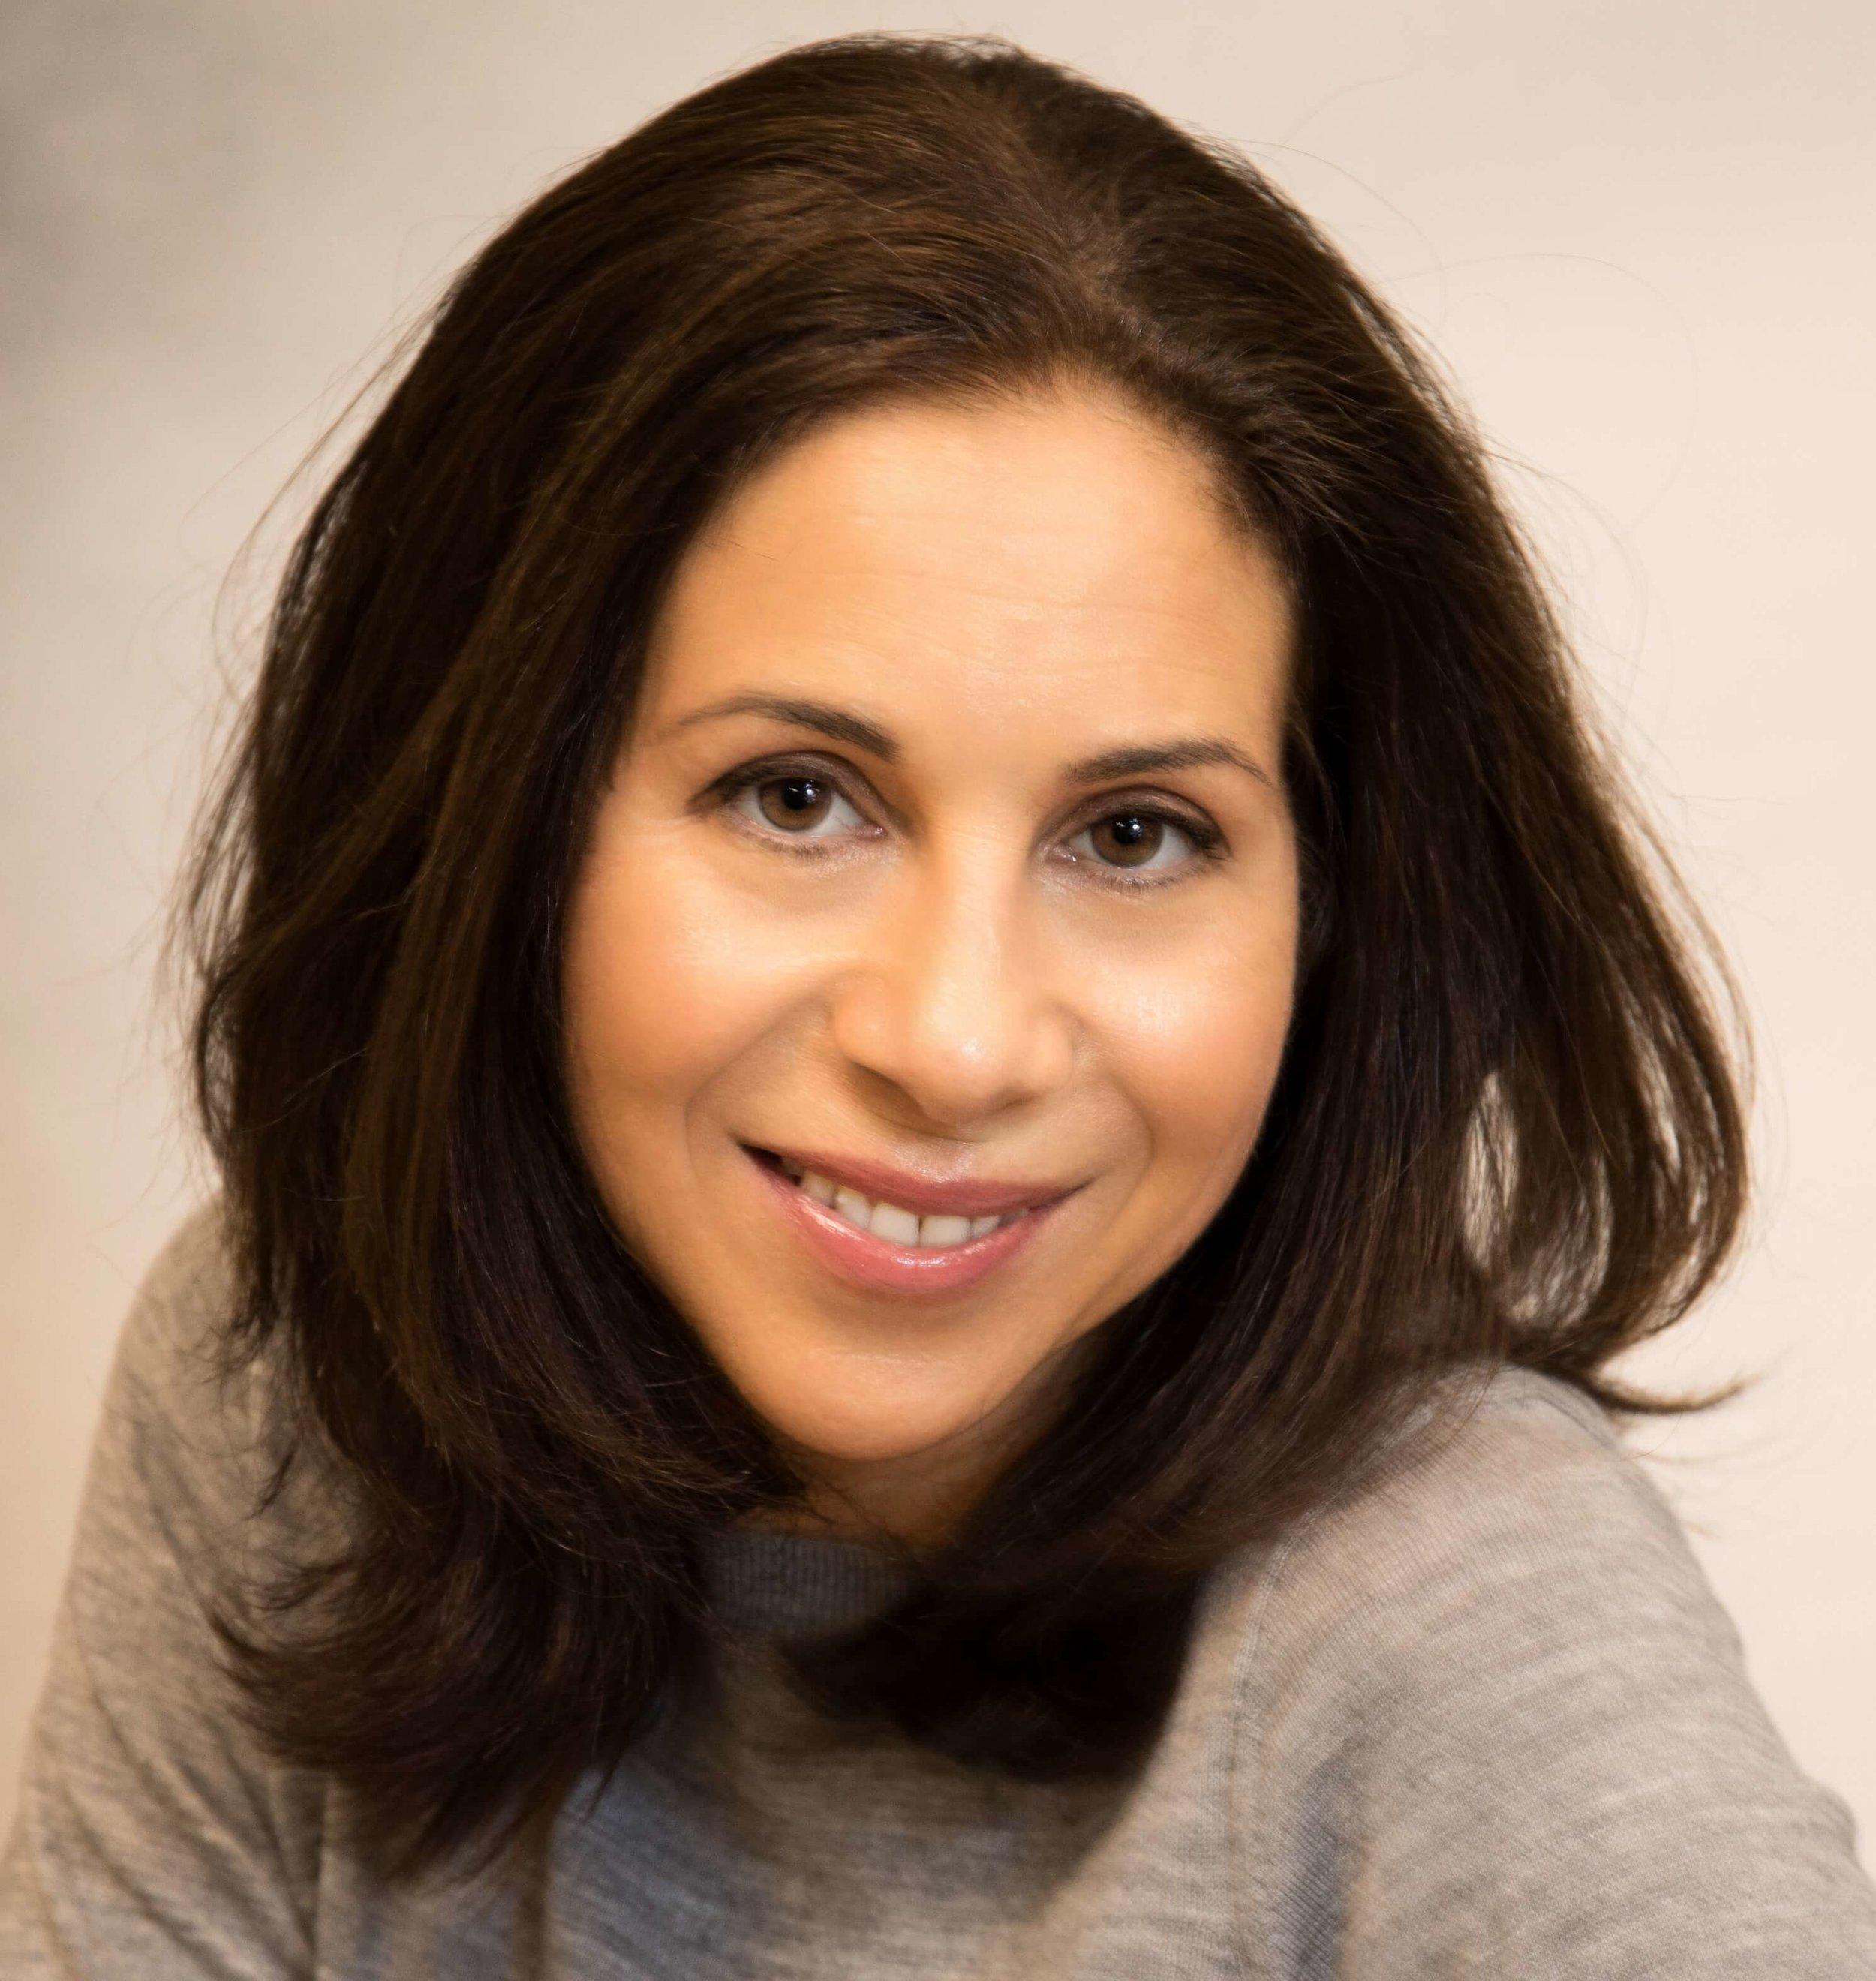 Melinda Paraie